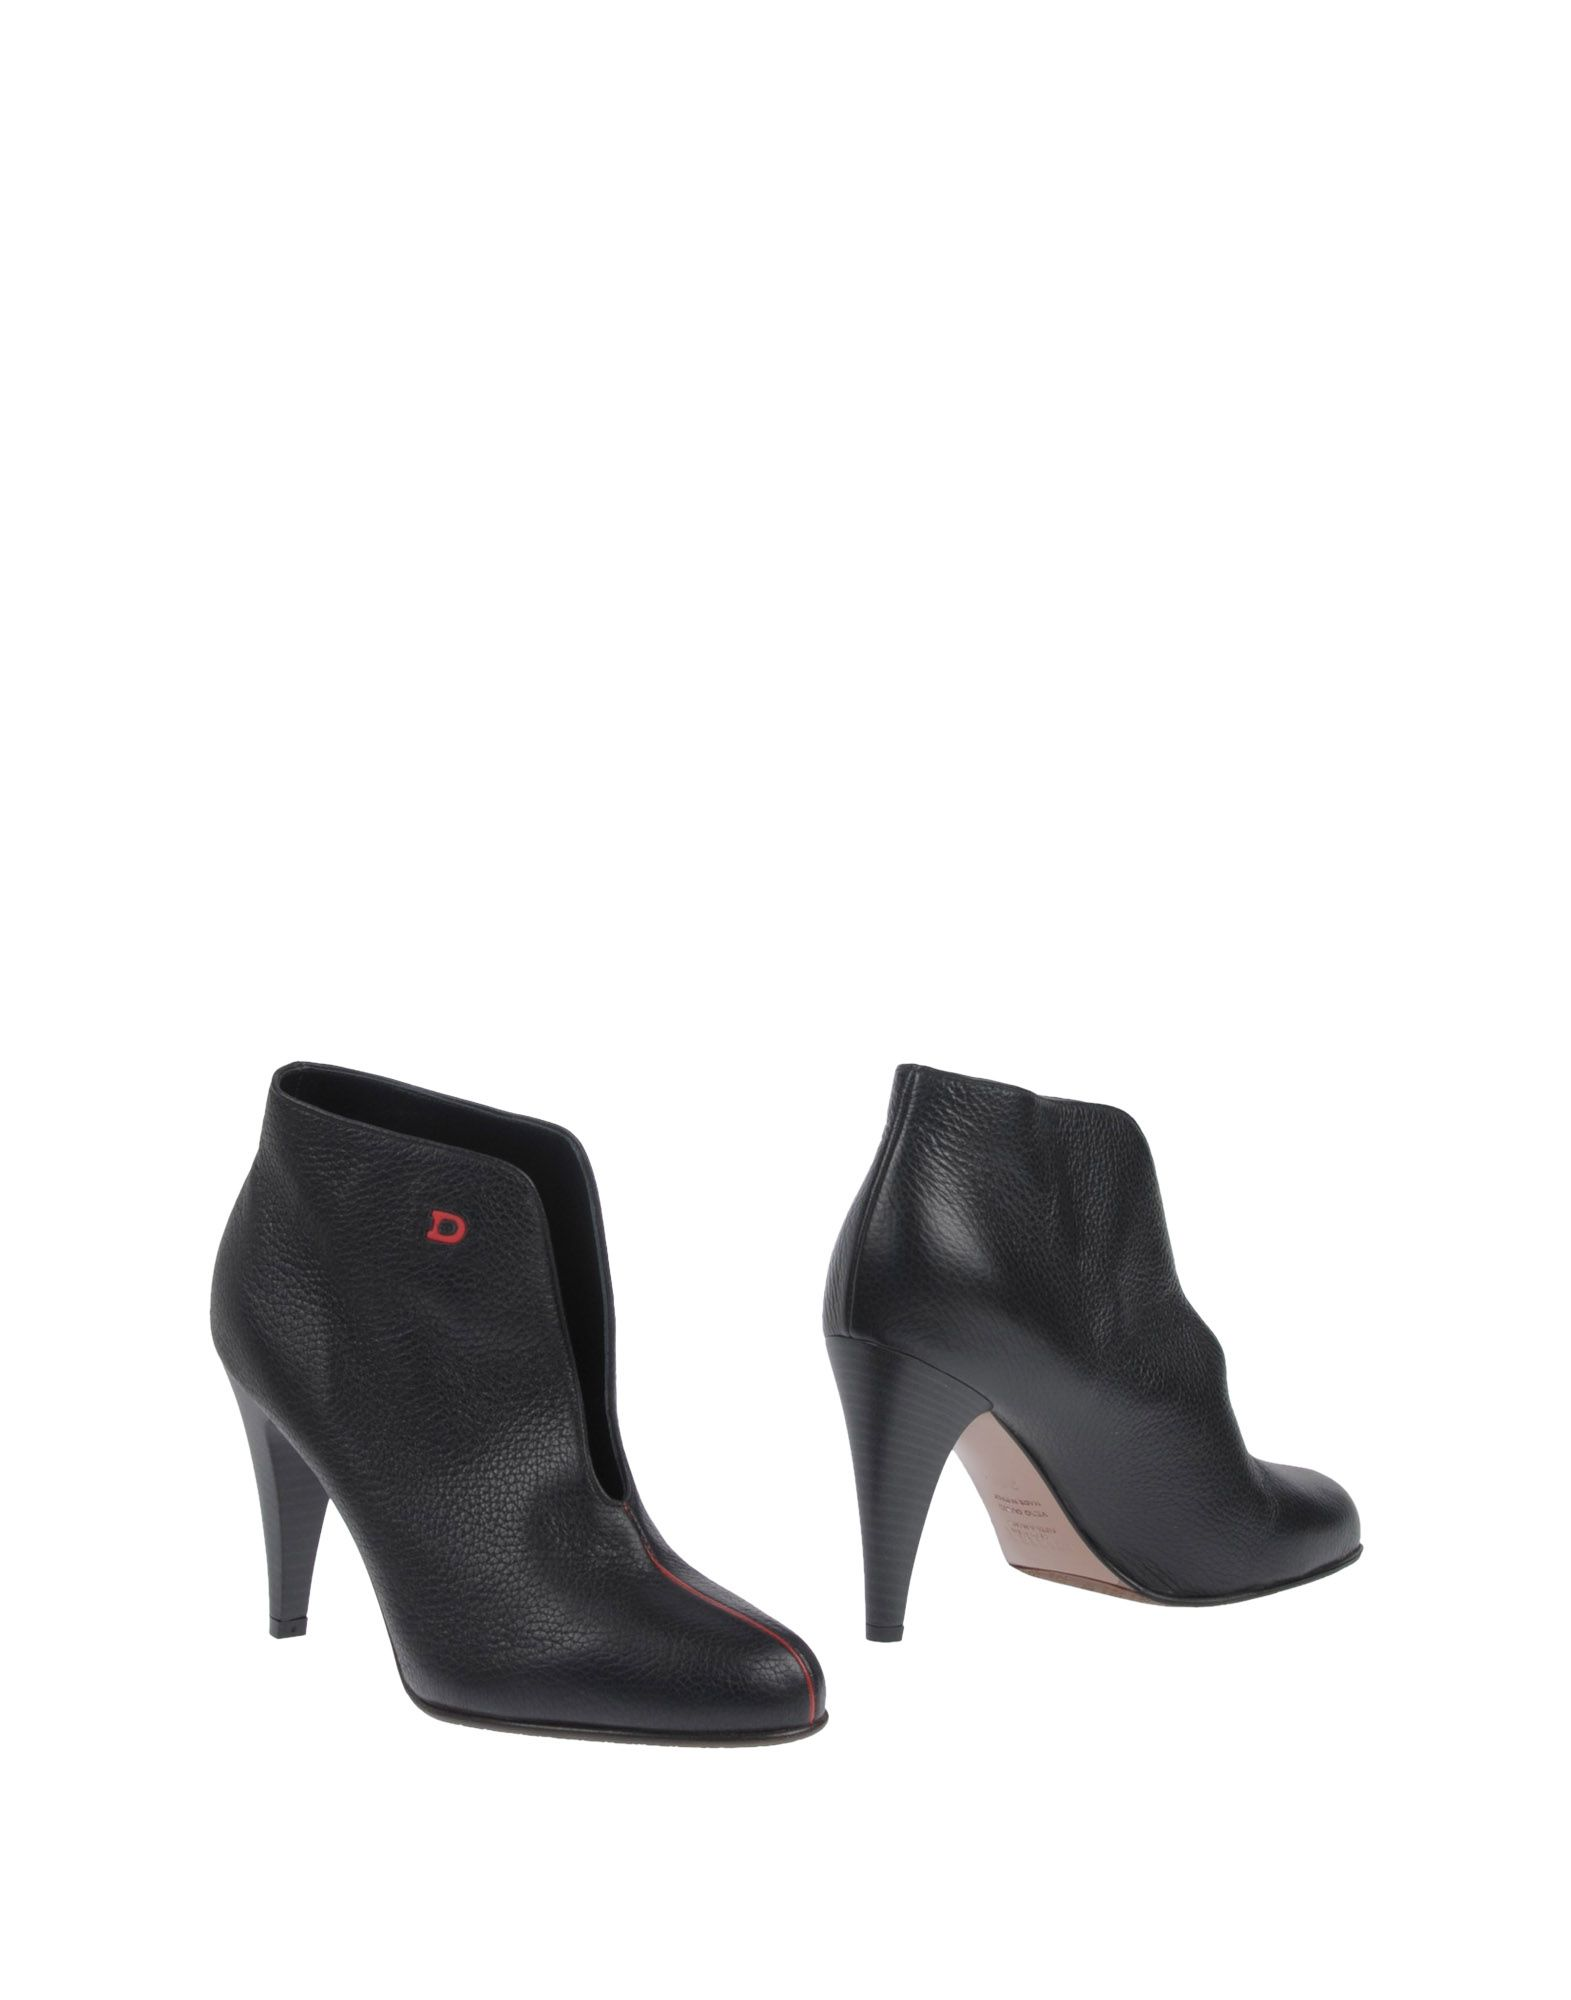 Dibrera By Paolo Zanoli Stiefelette Damen  11445536RJGut aussehende strapazierfähige Schuhe